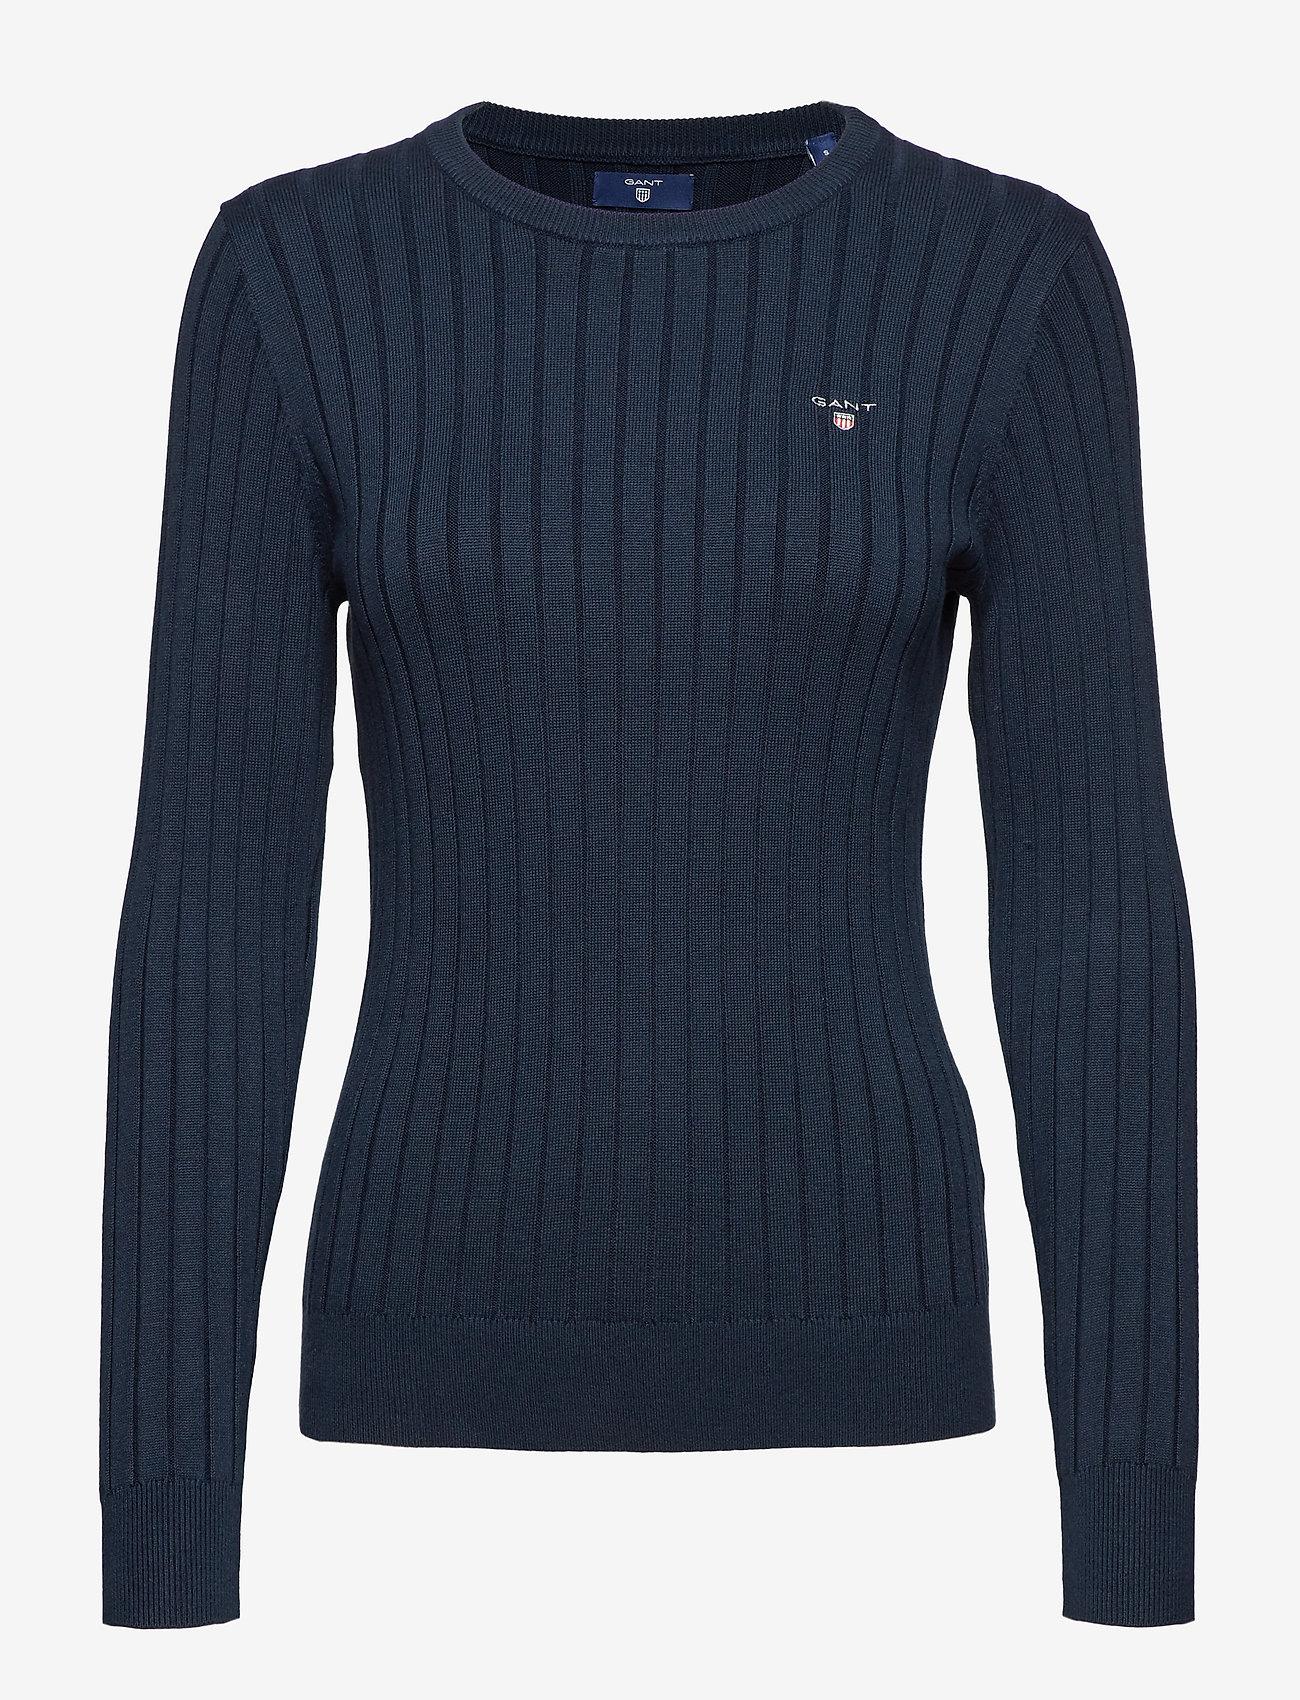 Gant - D1. STRETCH COTTON RIB CREW - jumpers - evening blue